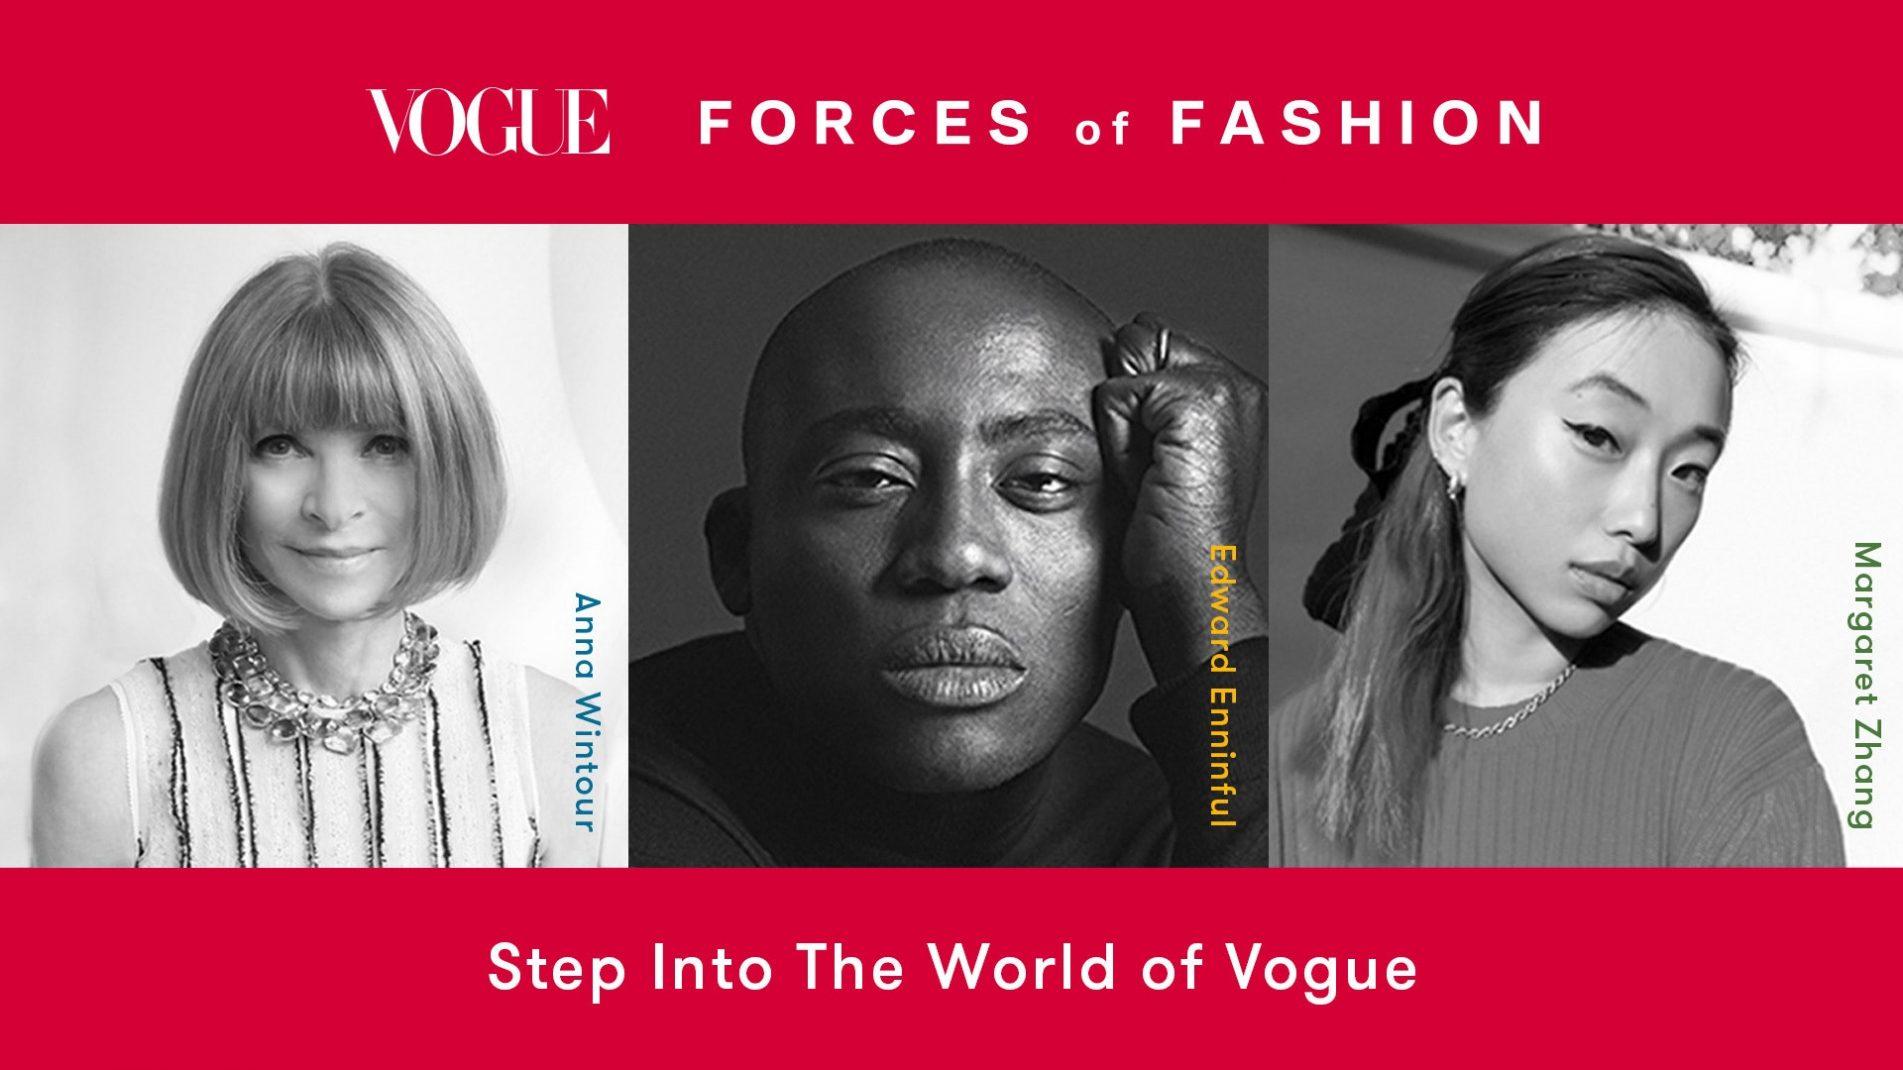 Vogue_FoF_Article_1920x1080_1